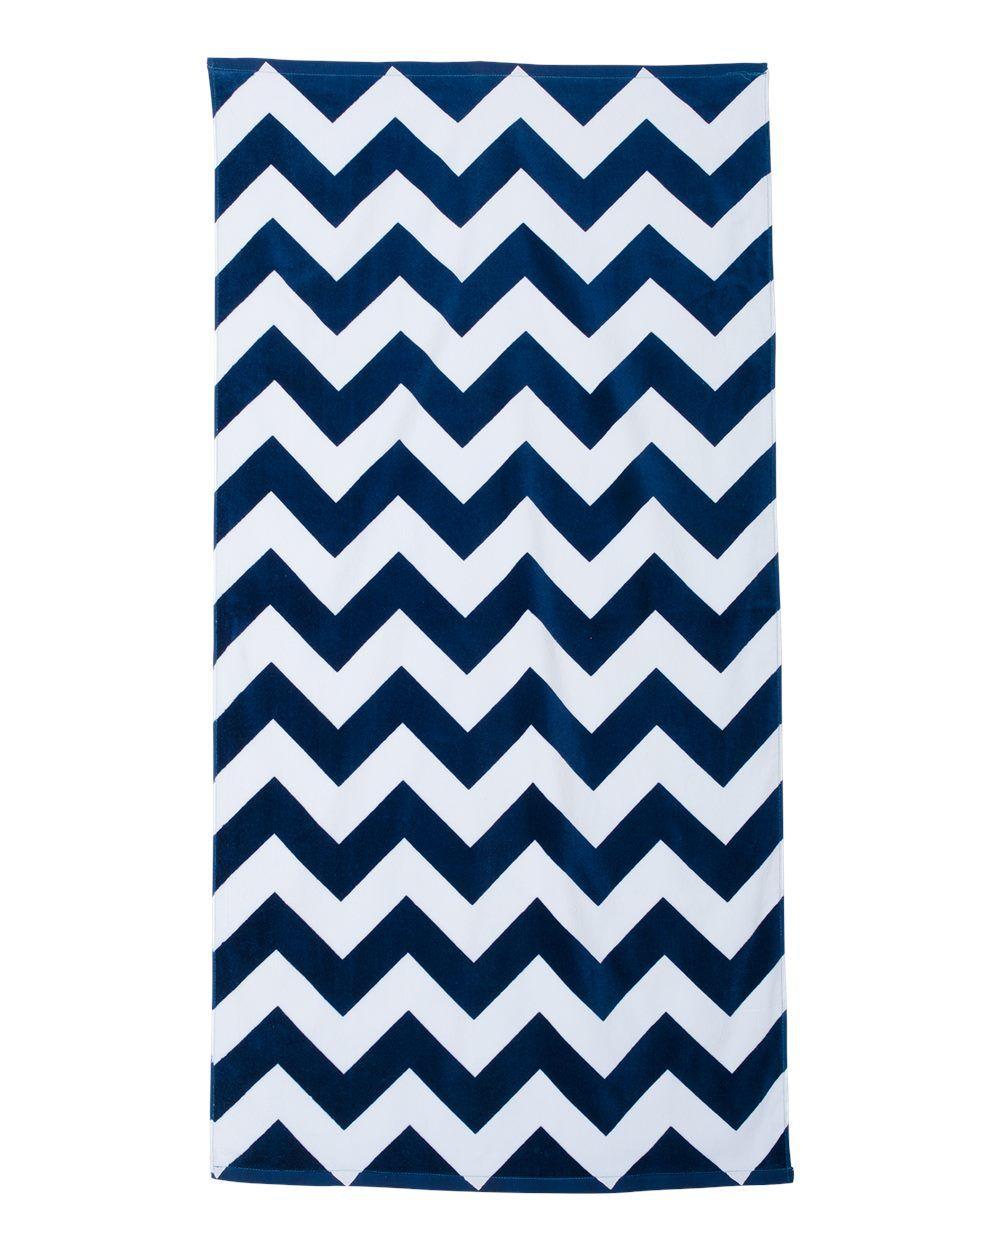 Carmel Towel Company Chevron Velour Beach Towel C3060x With